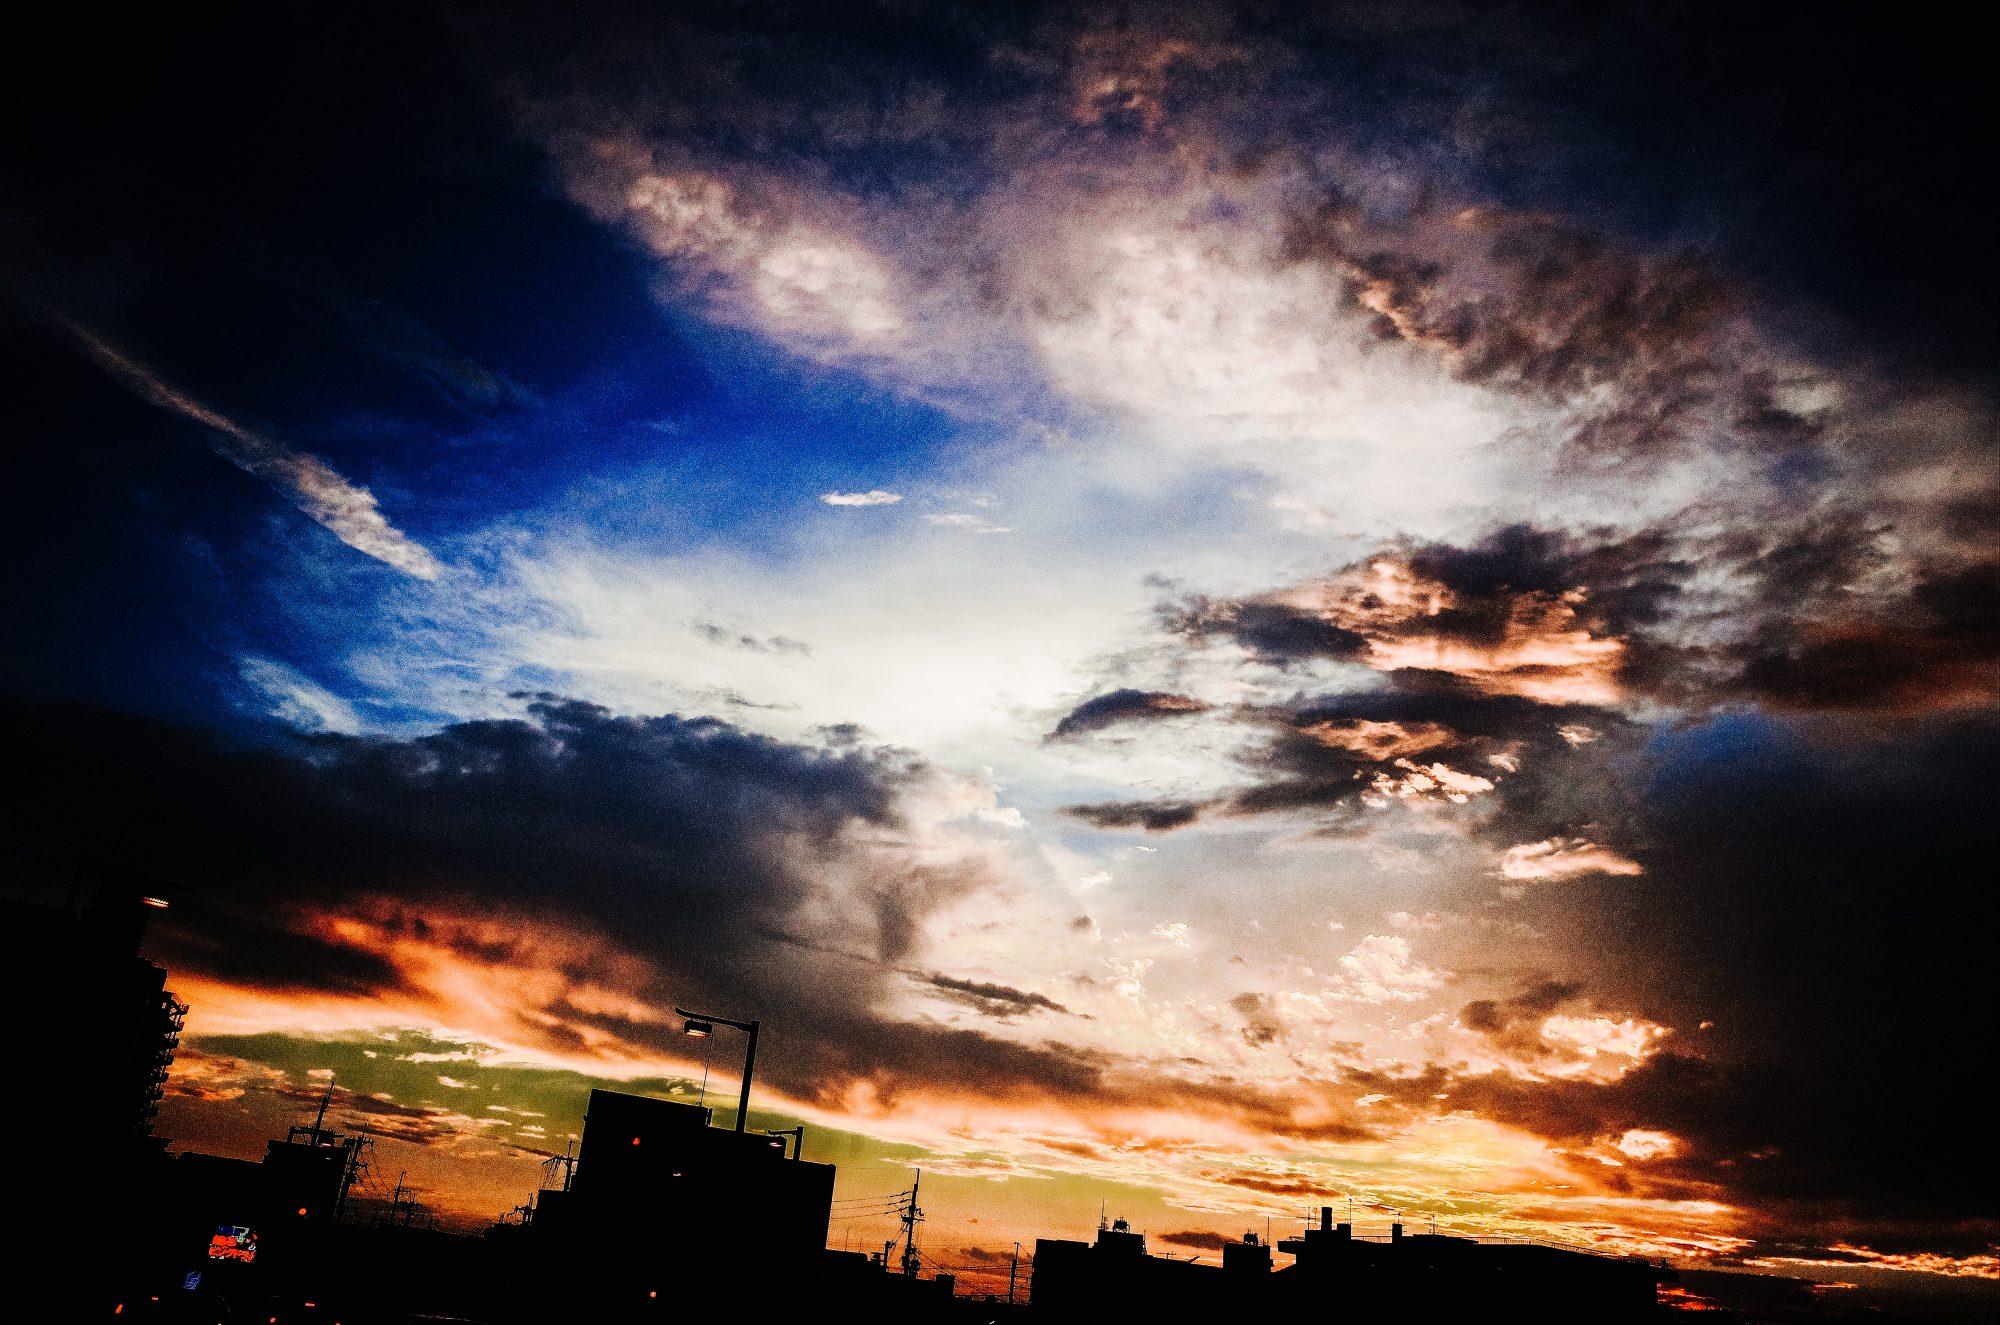 Sunset over Uji, Kyoto 2017